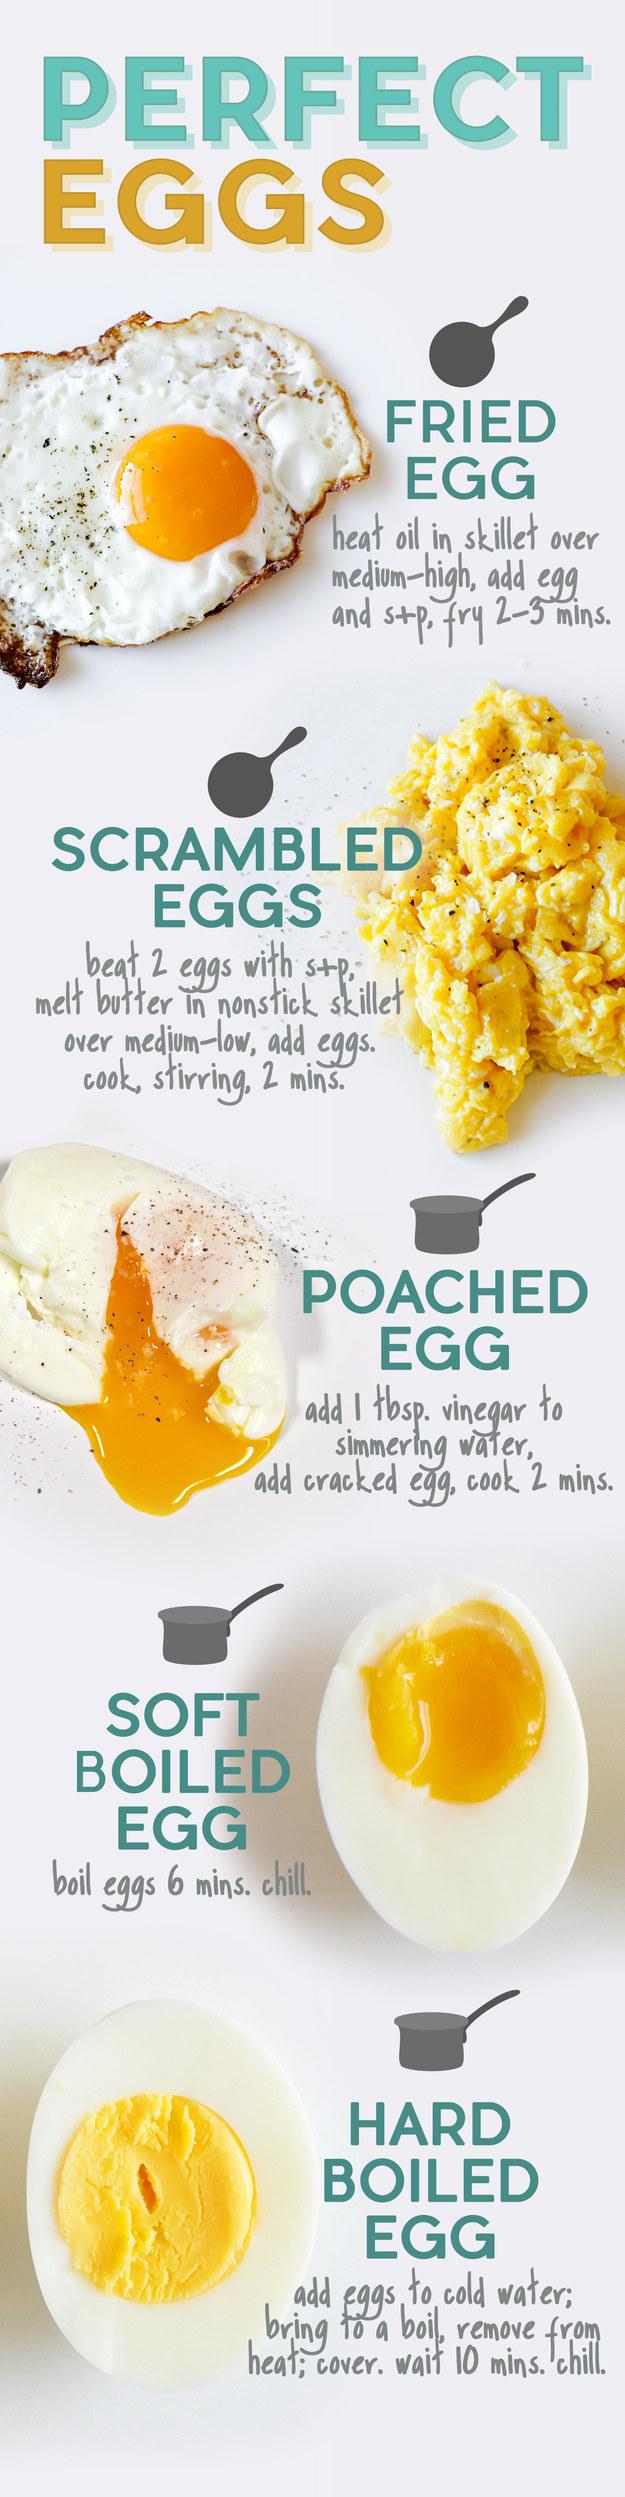 Ternyata, Begini 5 Trik Masak Telur yang Sempurna dan Lezat!